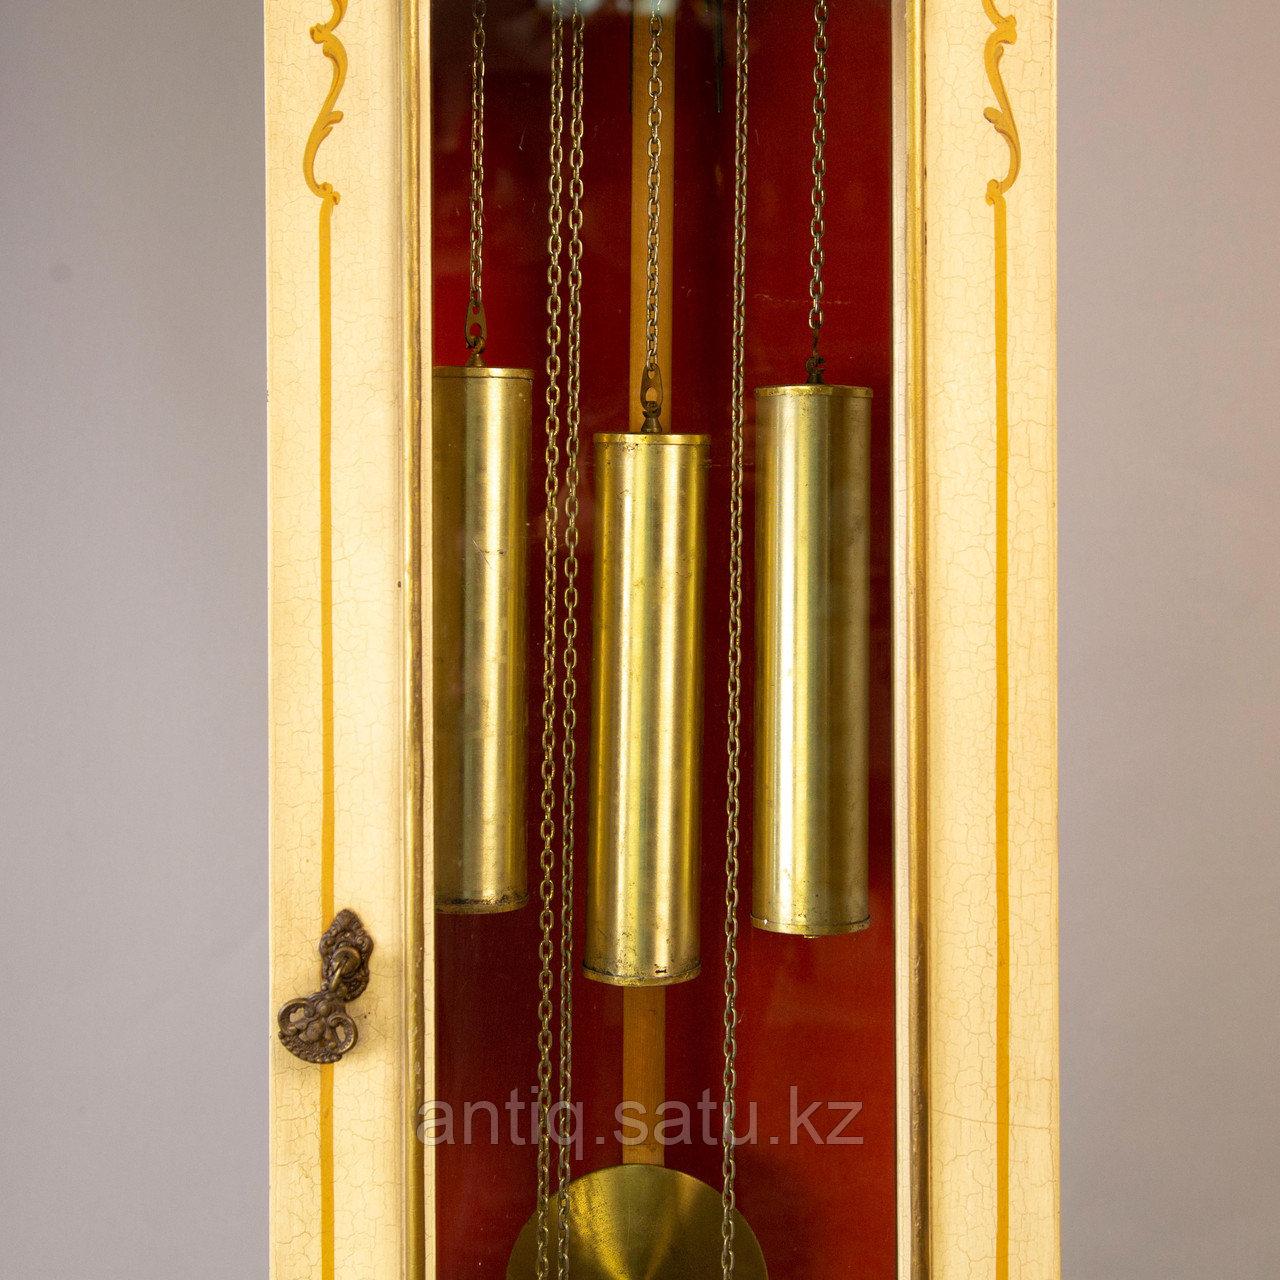 Напольные часы. Часовая мастерская Franz Hermle & Sohne. Германия. 1977 год. - фото 4